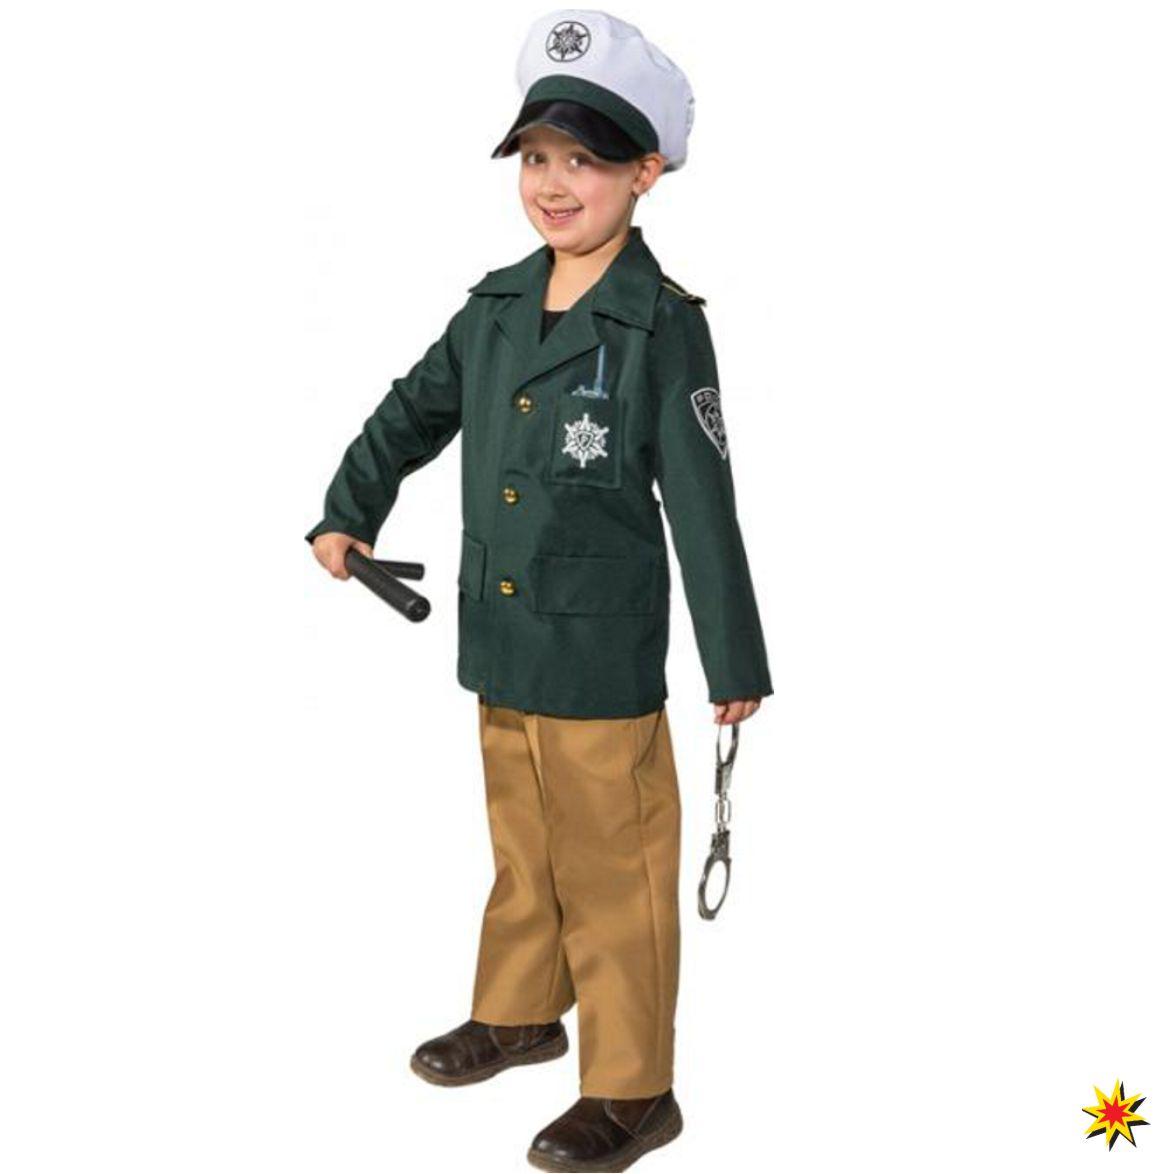 Kinderkostüm Polizist Uniform braun grün Fasching Karneval Polizei